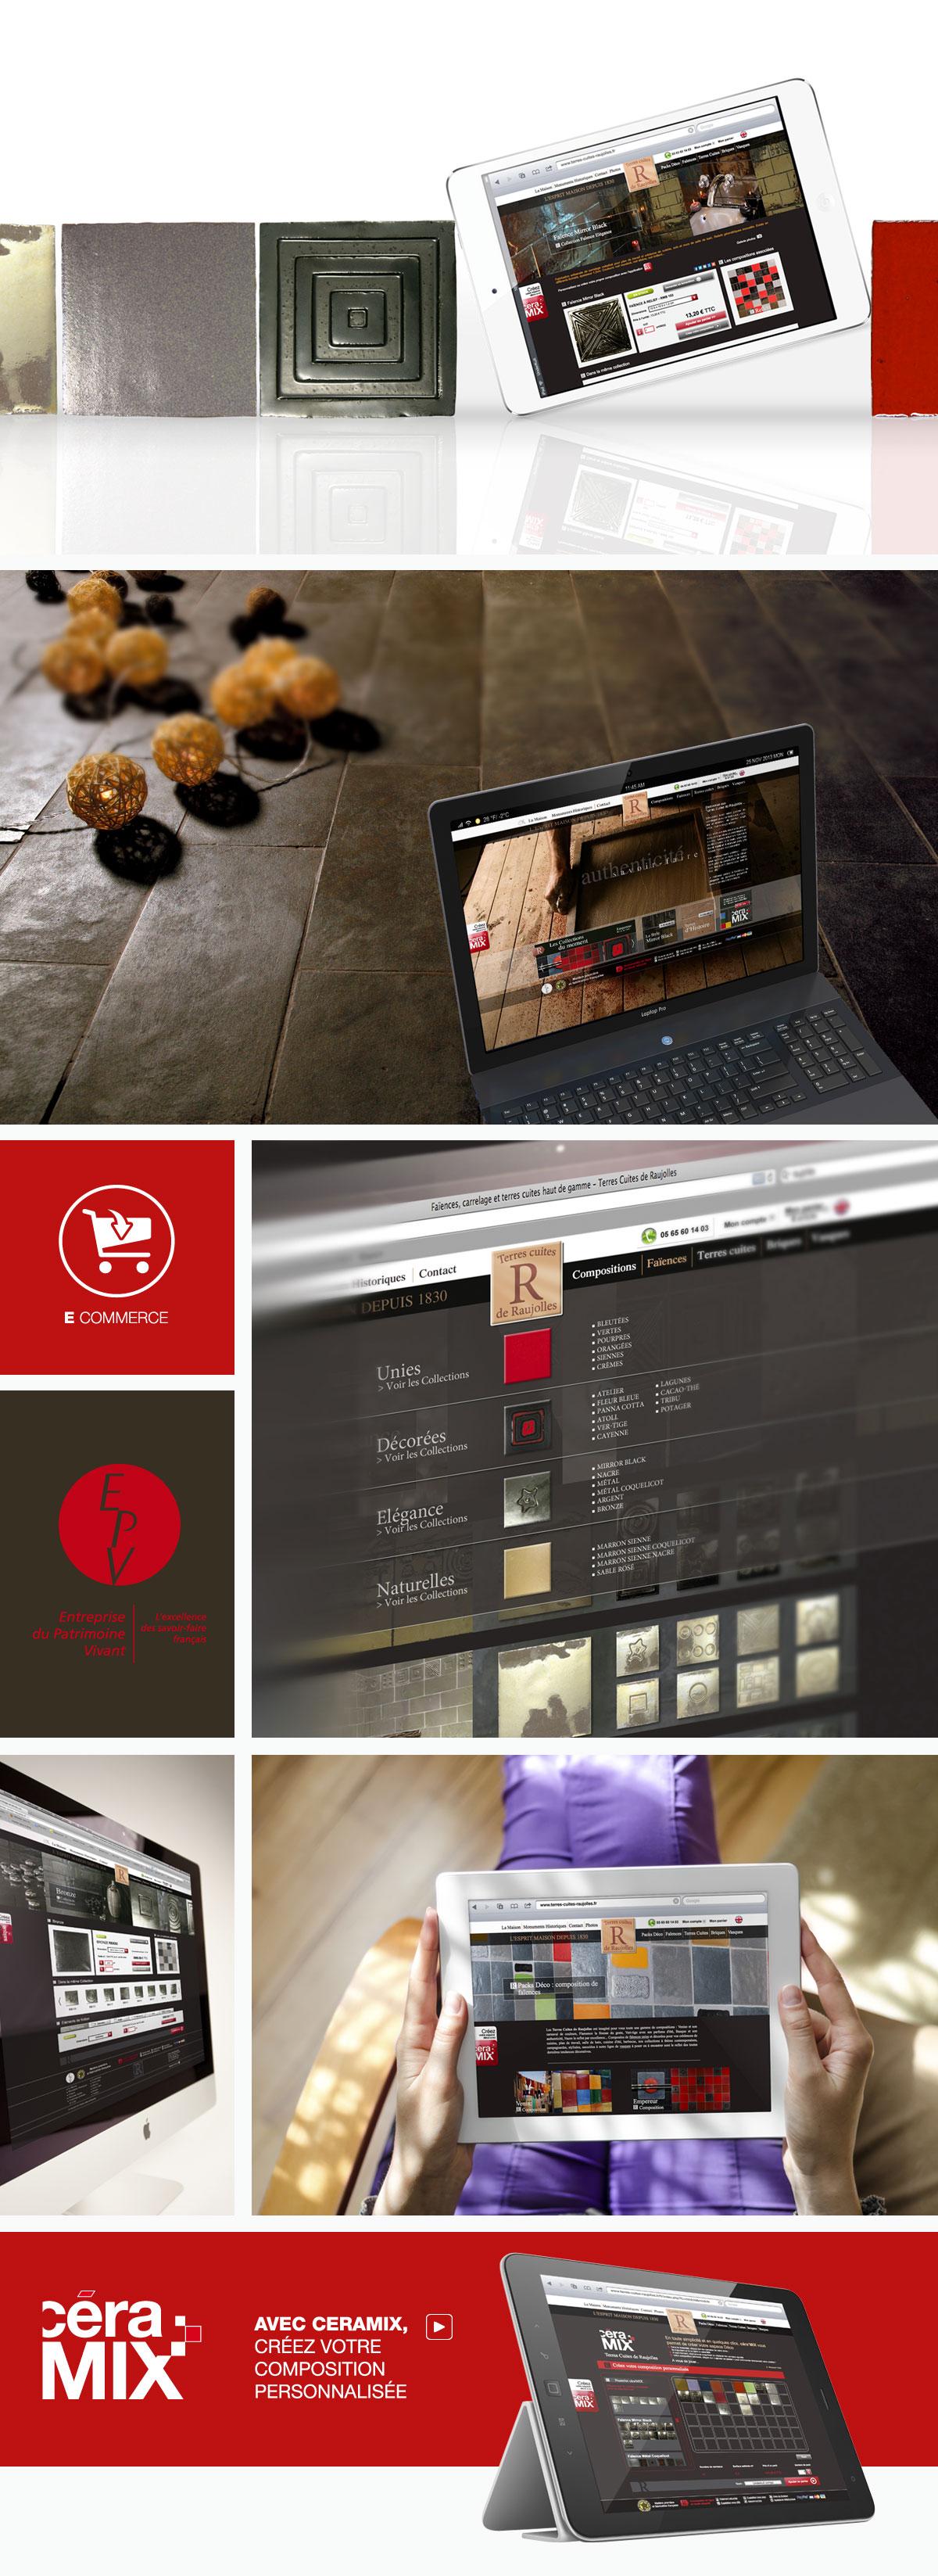 terres cuites de raujolles aveyron agence de. Black Bedroom Furniture Sets. Home Design Ideas